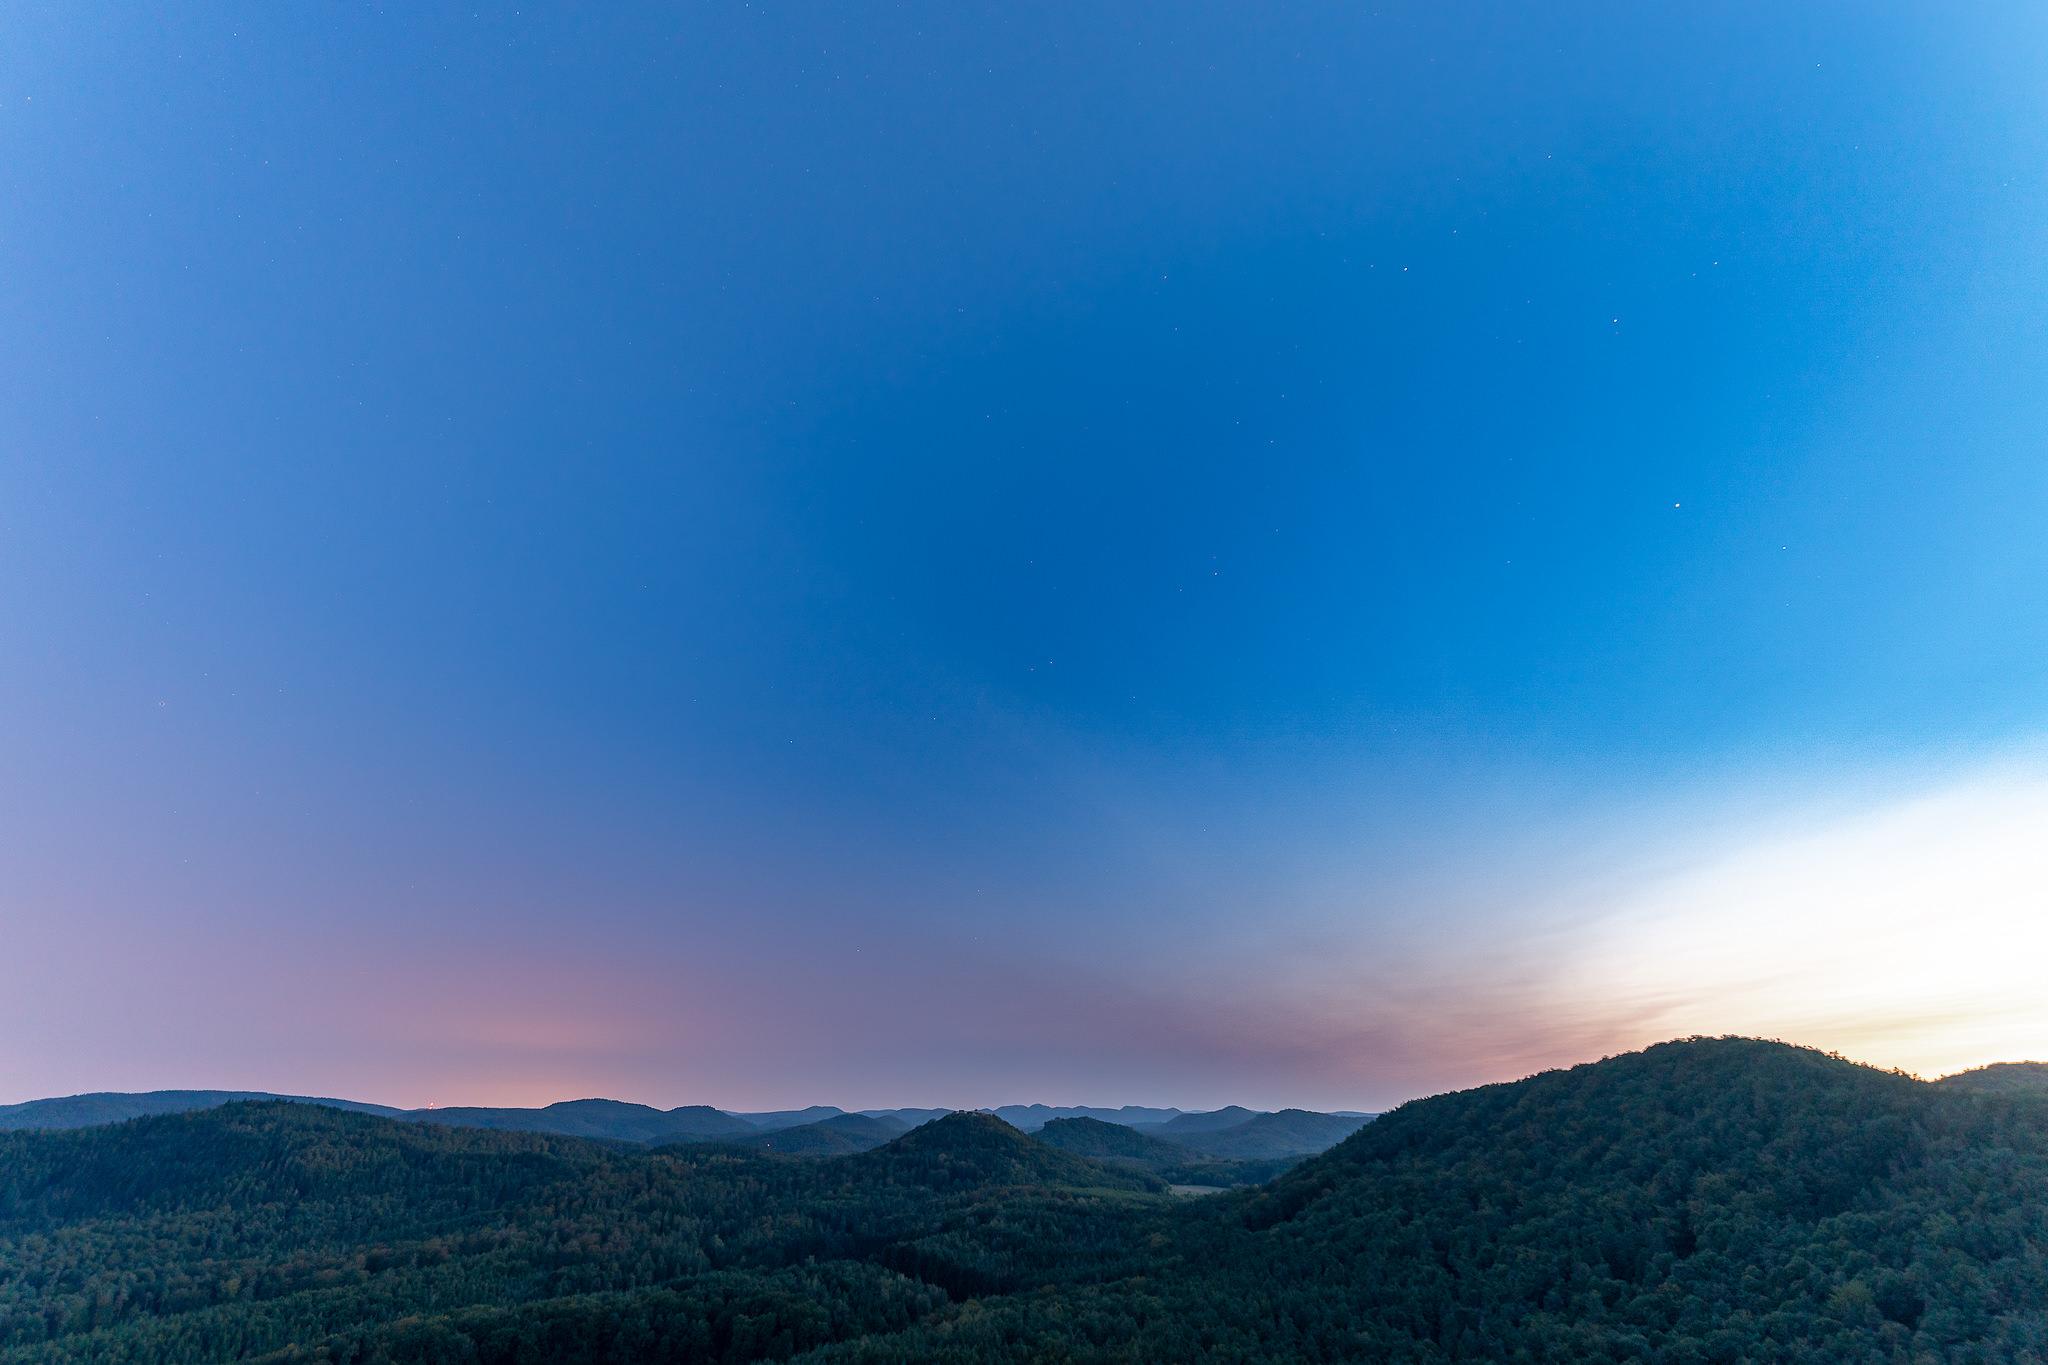 Pastellfarbener Himmel zur Dämmerung über Lindelbrunn